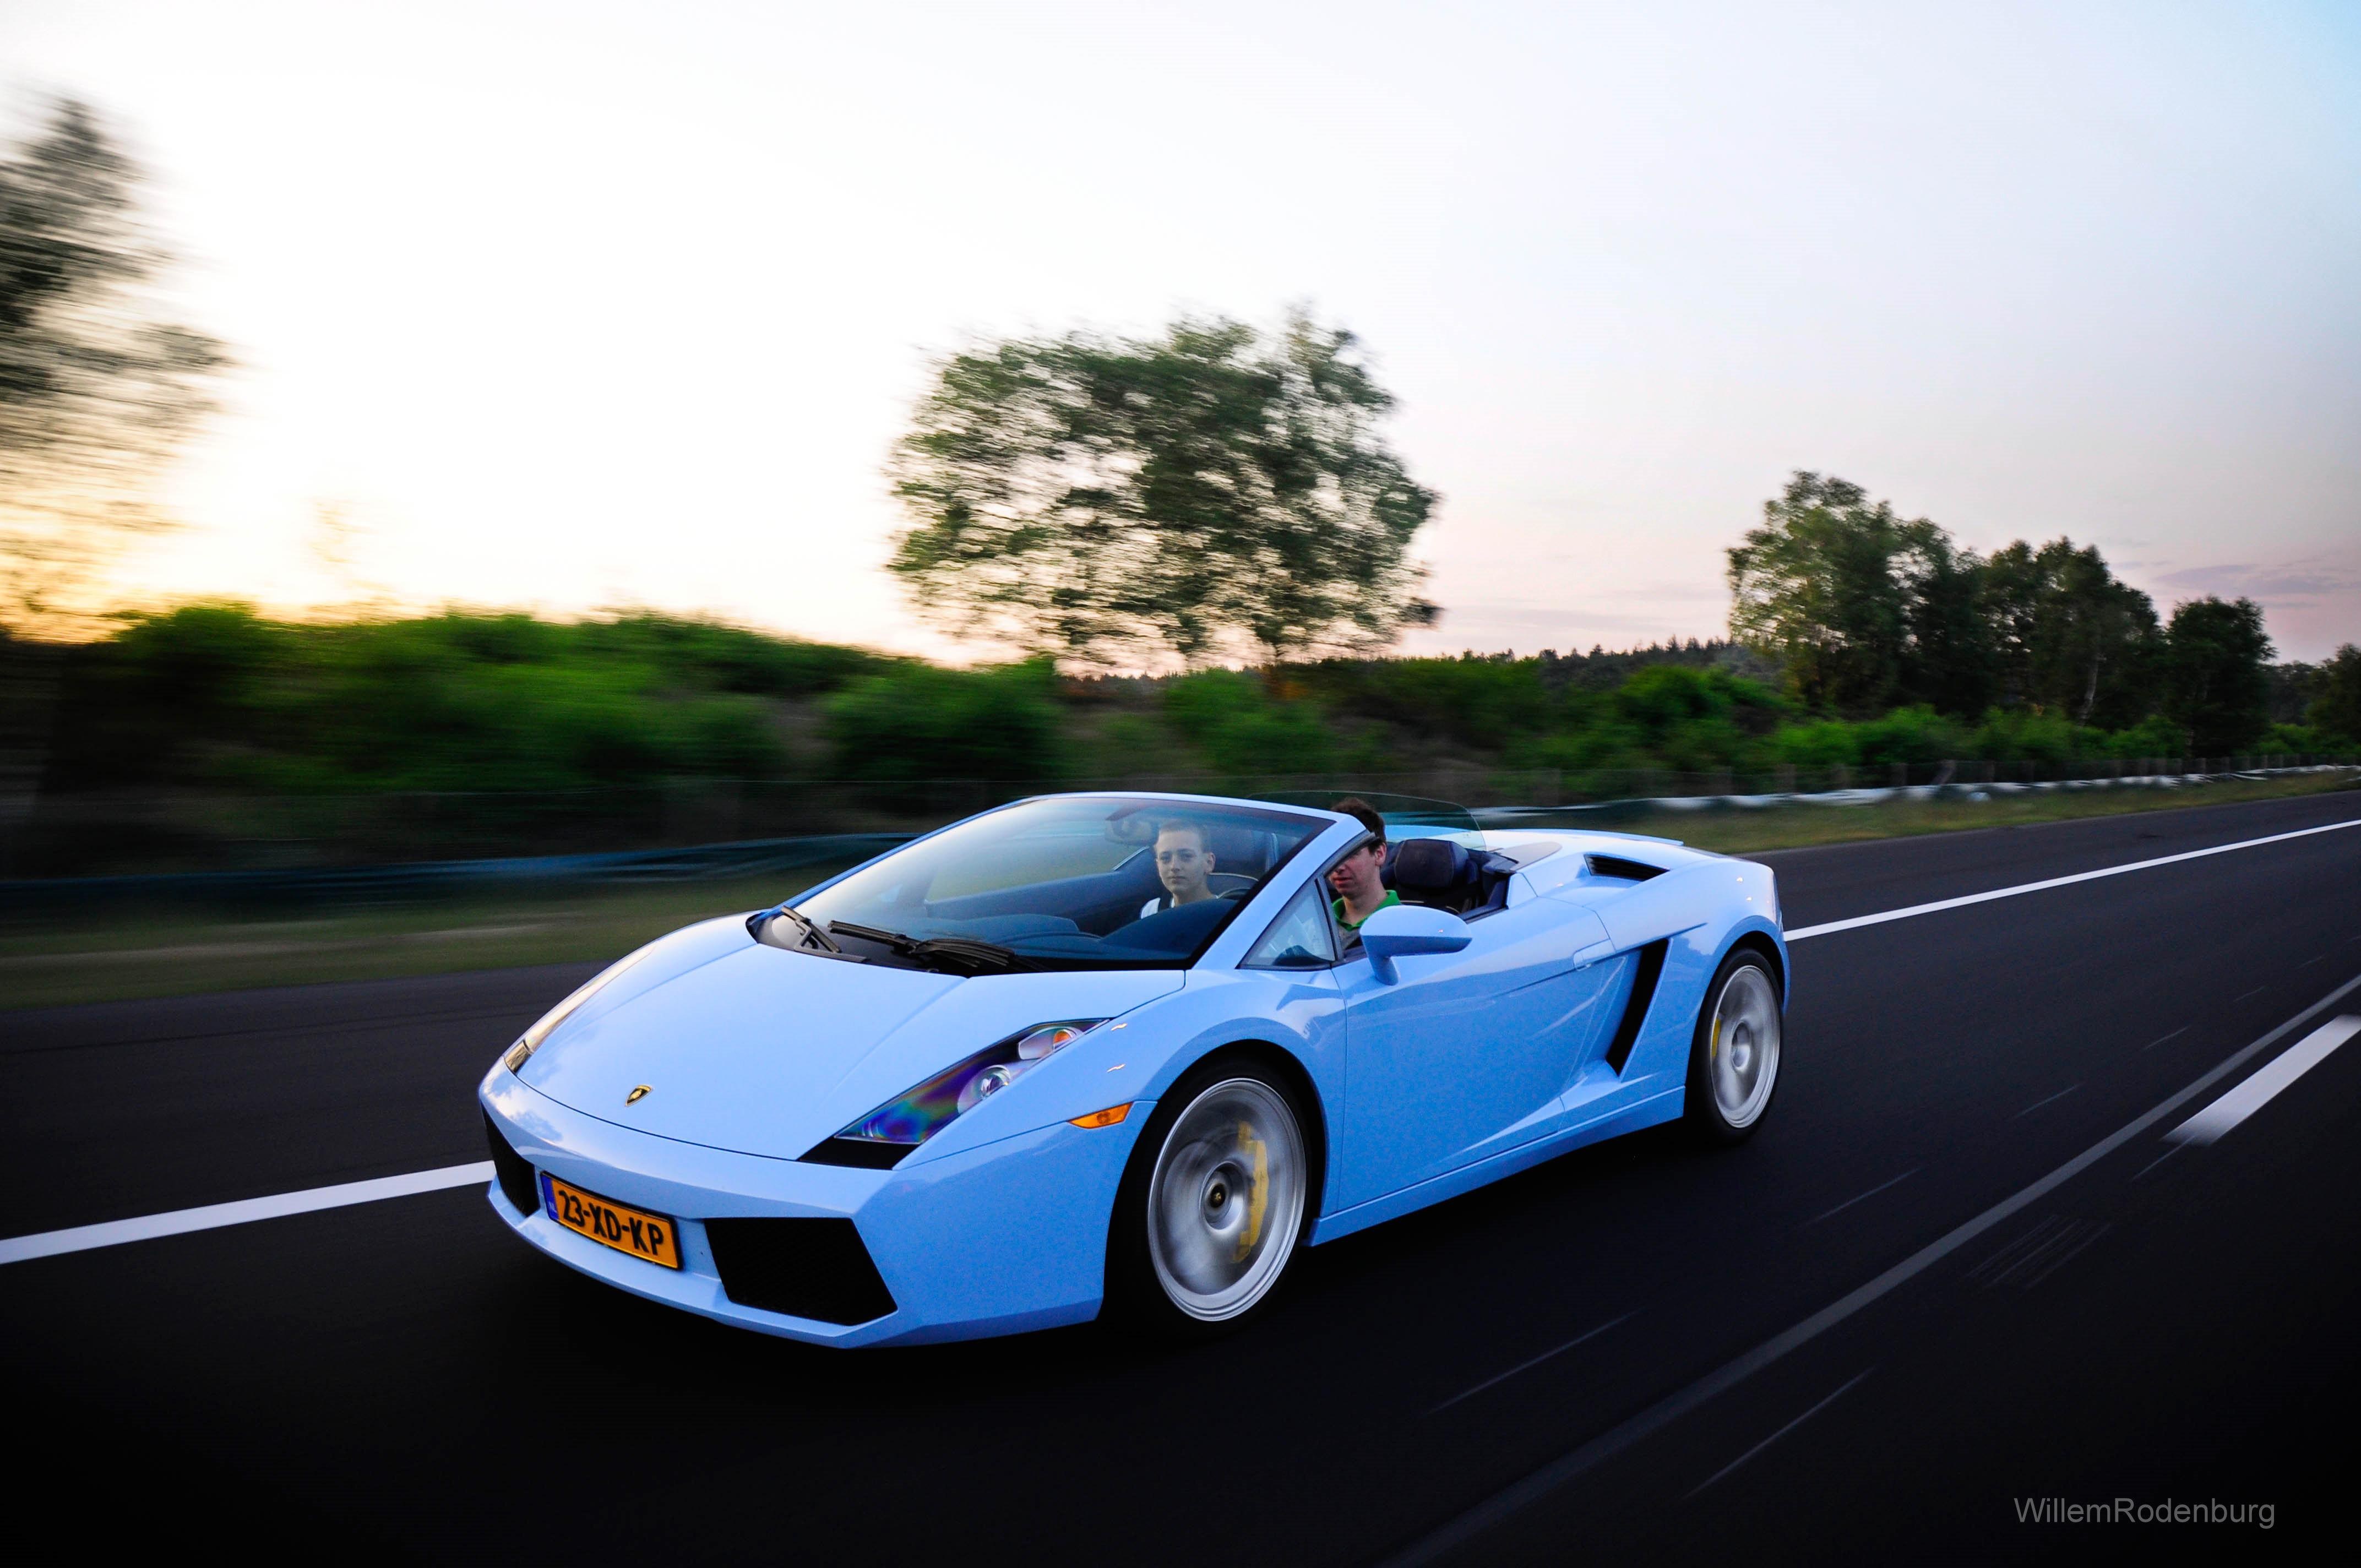 Wallpaper : Photoshop, Baby, Netherlands, Nikon, Lamborghini Gallardo,  Sports Car, Tracking, Lightroom, Performance Car, Engine, Spyder, Shooting,  Panning, ...